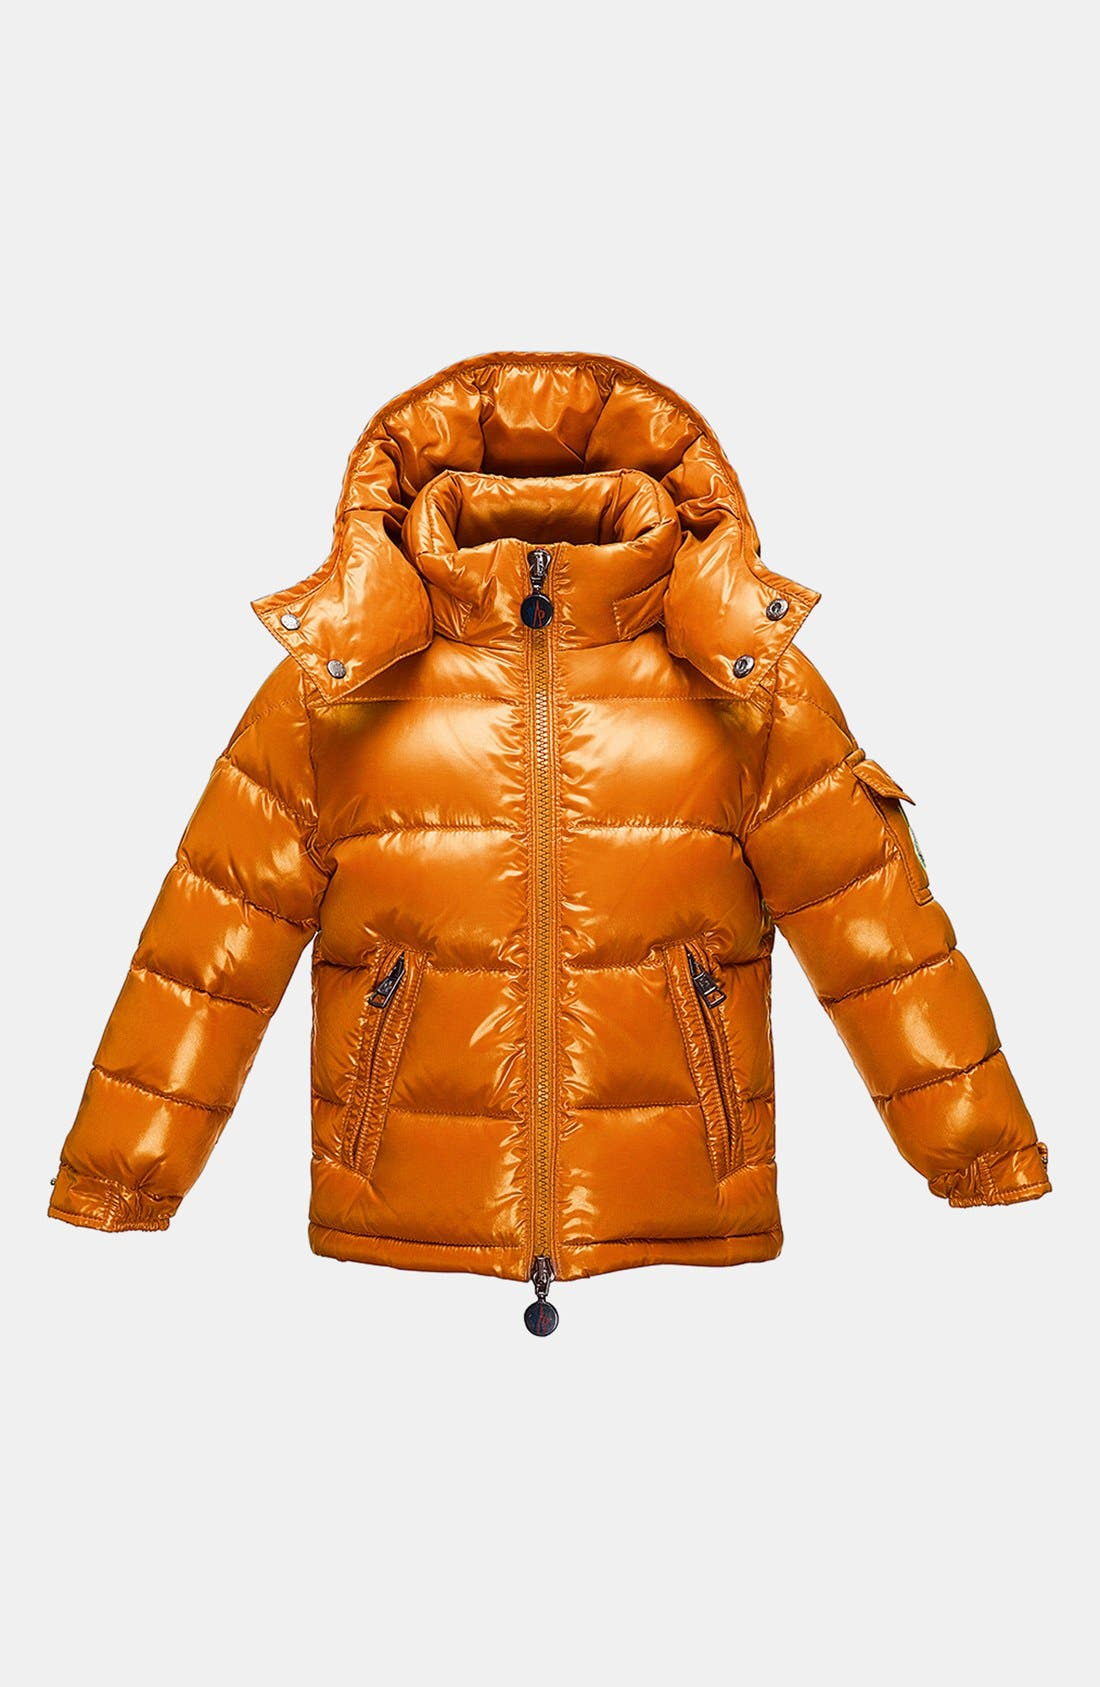 Alternate Image 1 Selected - Moncler 'Maya' Hooded Down Jacket (Little Boys & Big Boys)